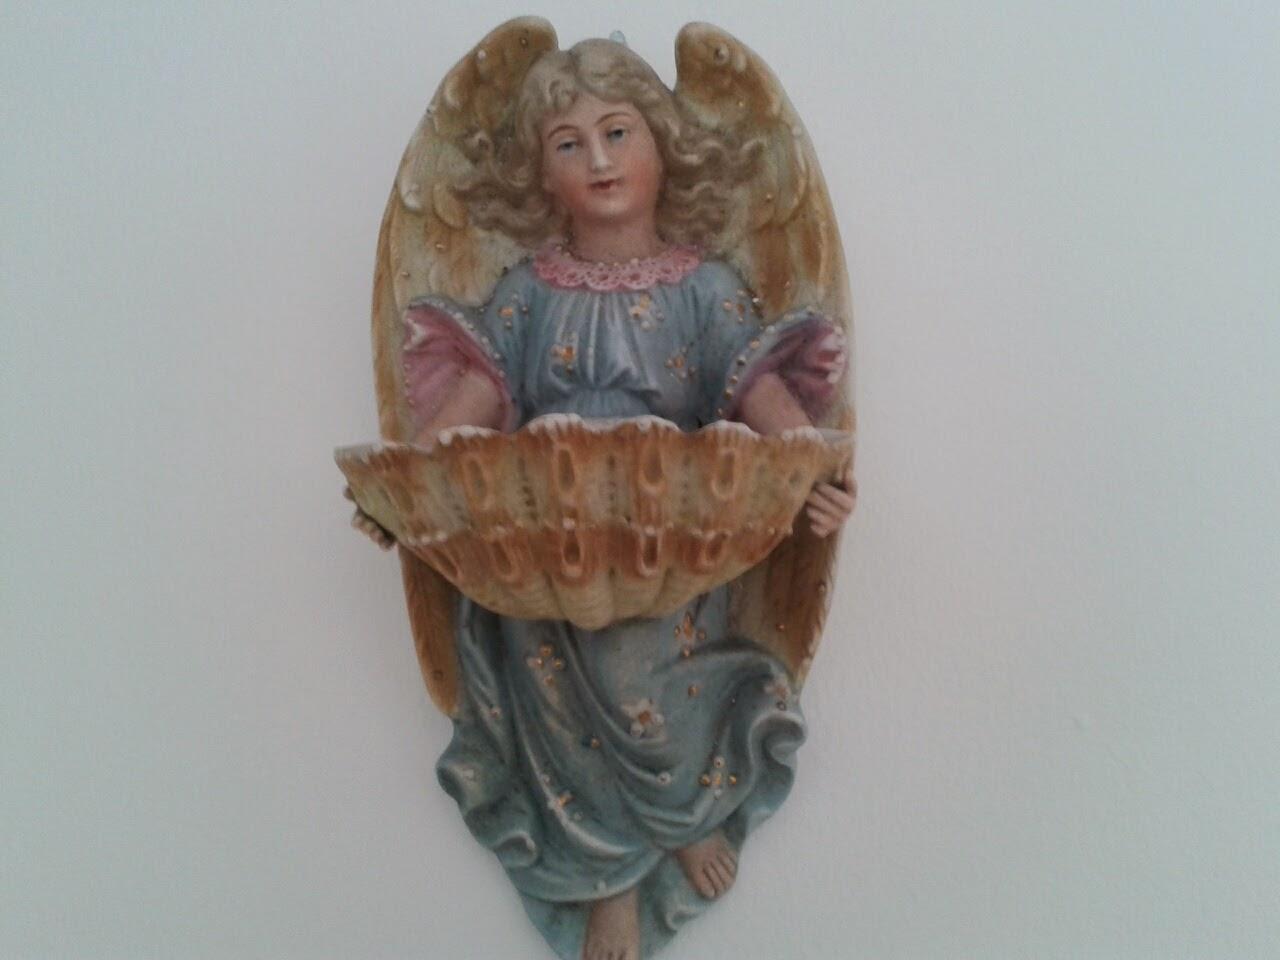 Maria Tenhemelopening